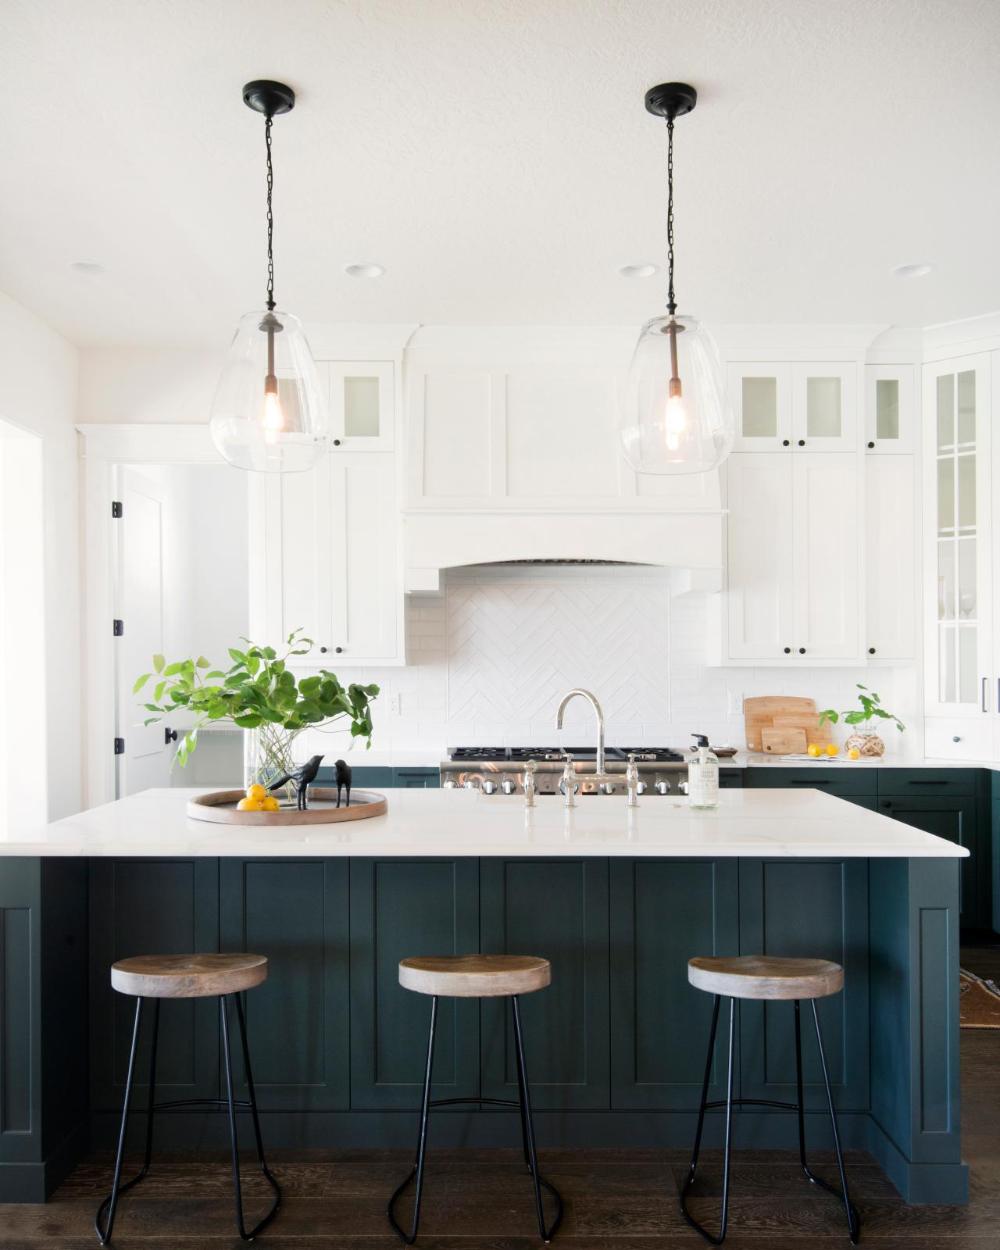 10 Blue-tiful Kitchen Cabinet Color Ideas